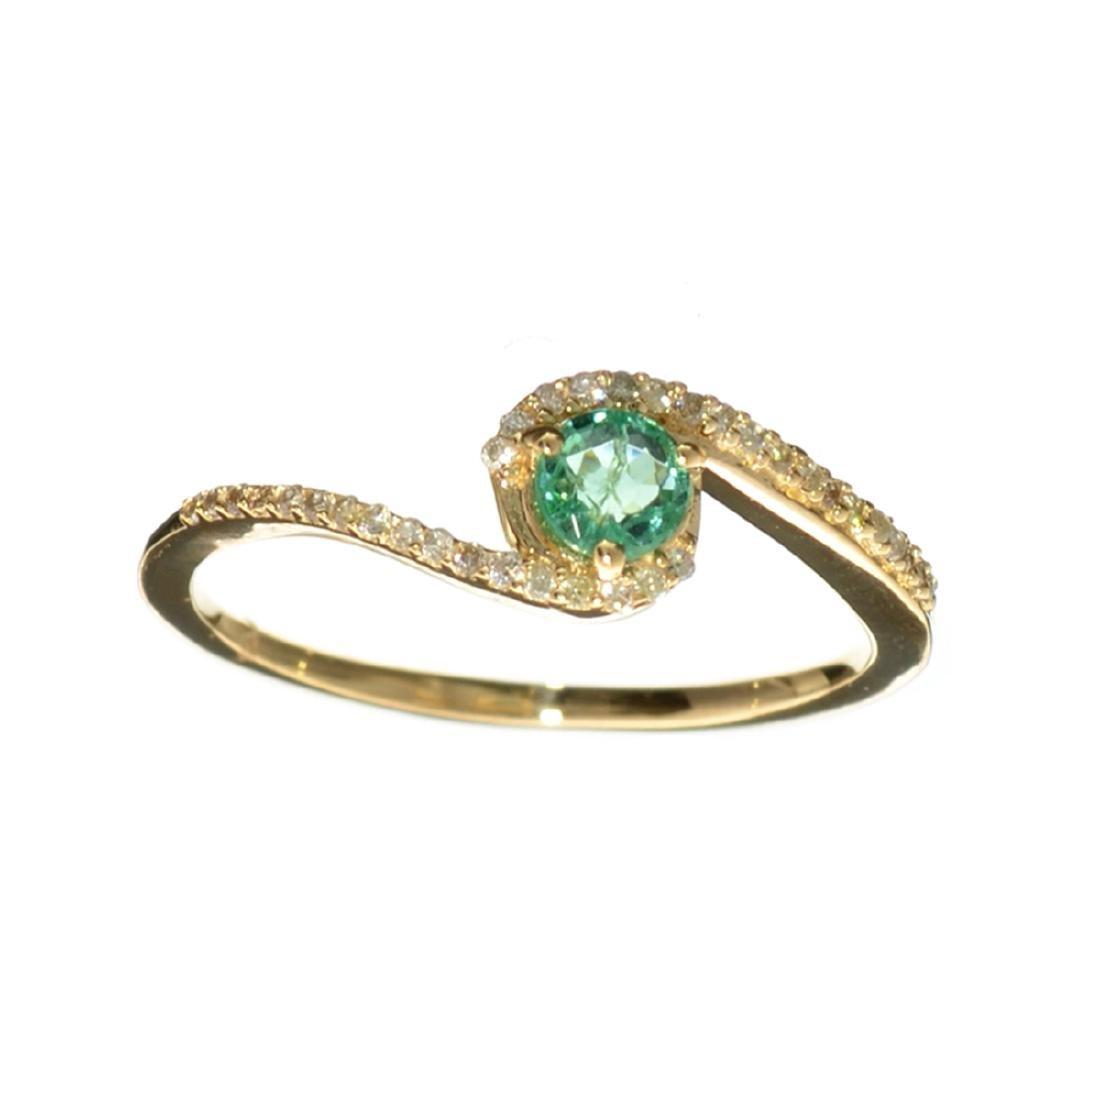 Designer Sebastian 14 KT Gold 0.32CT Emerald and 0.07CT